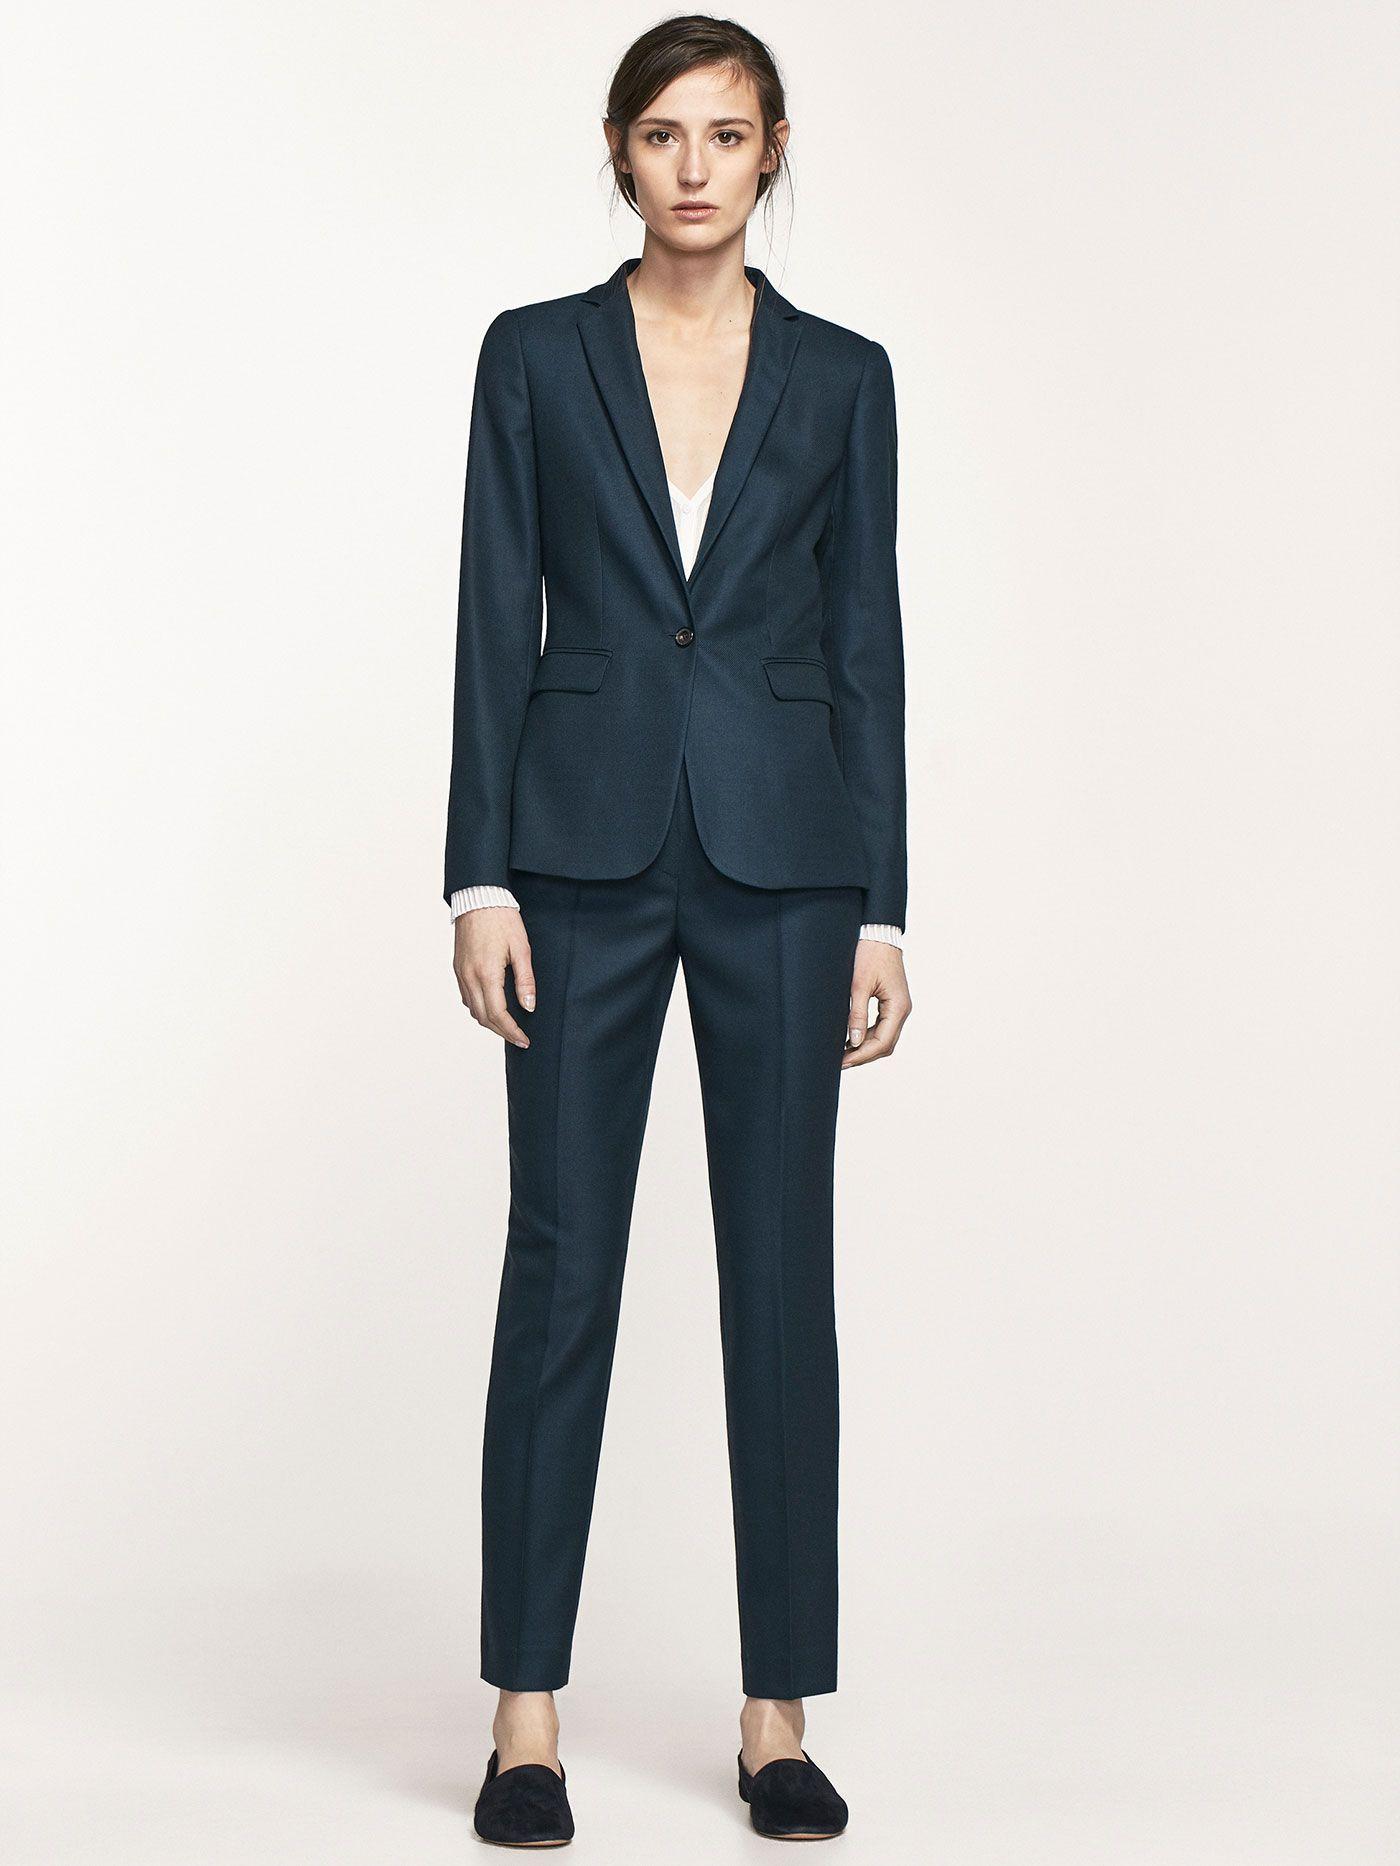 Massimo Dutti 2017 Suits For Women Blazer Fashion Fashion